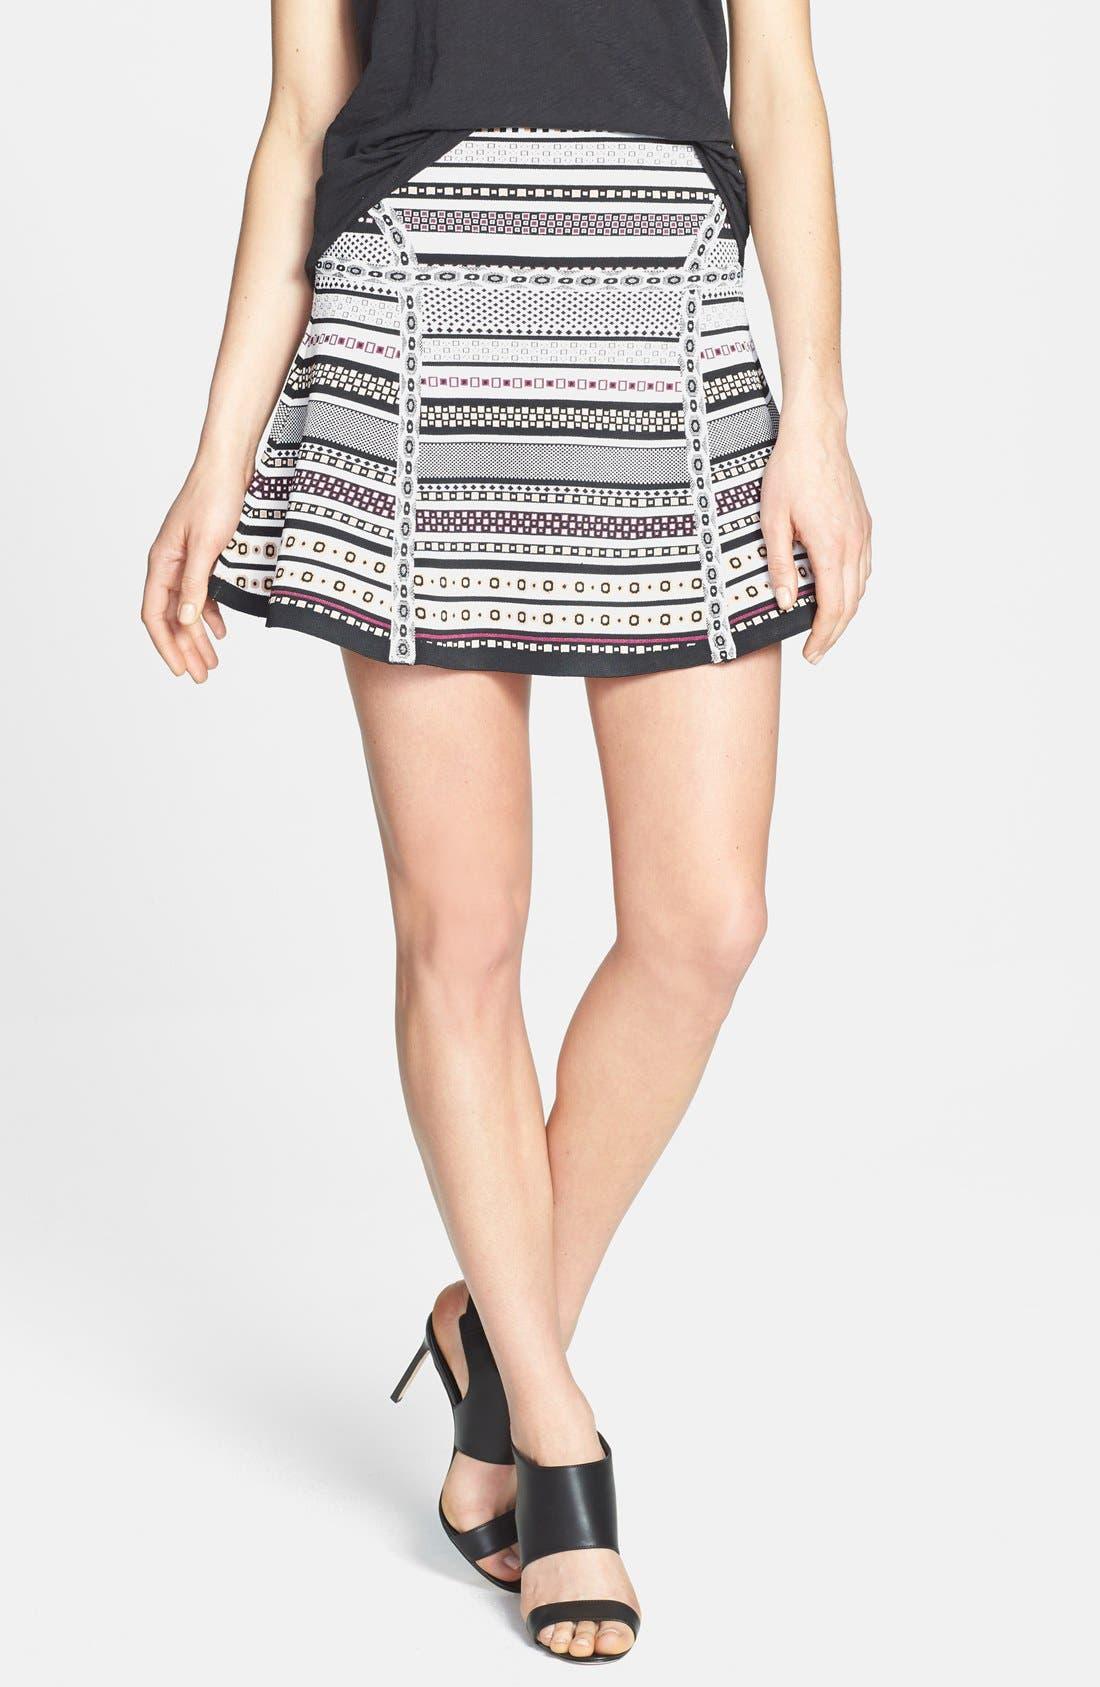 Alternate Image 1 Selected - Diane von Furstenberg 'Flote' Print Knit A-Line Skirt